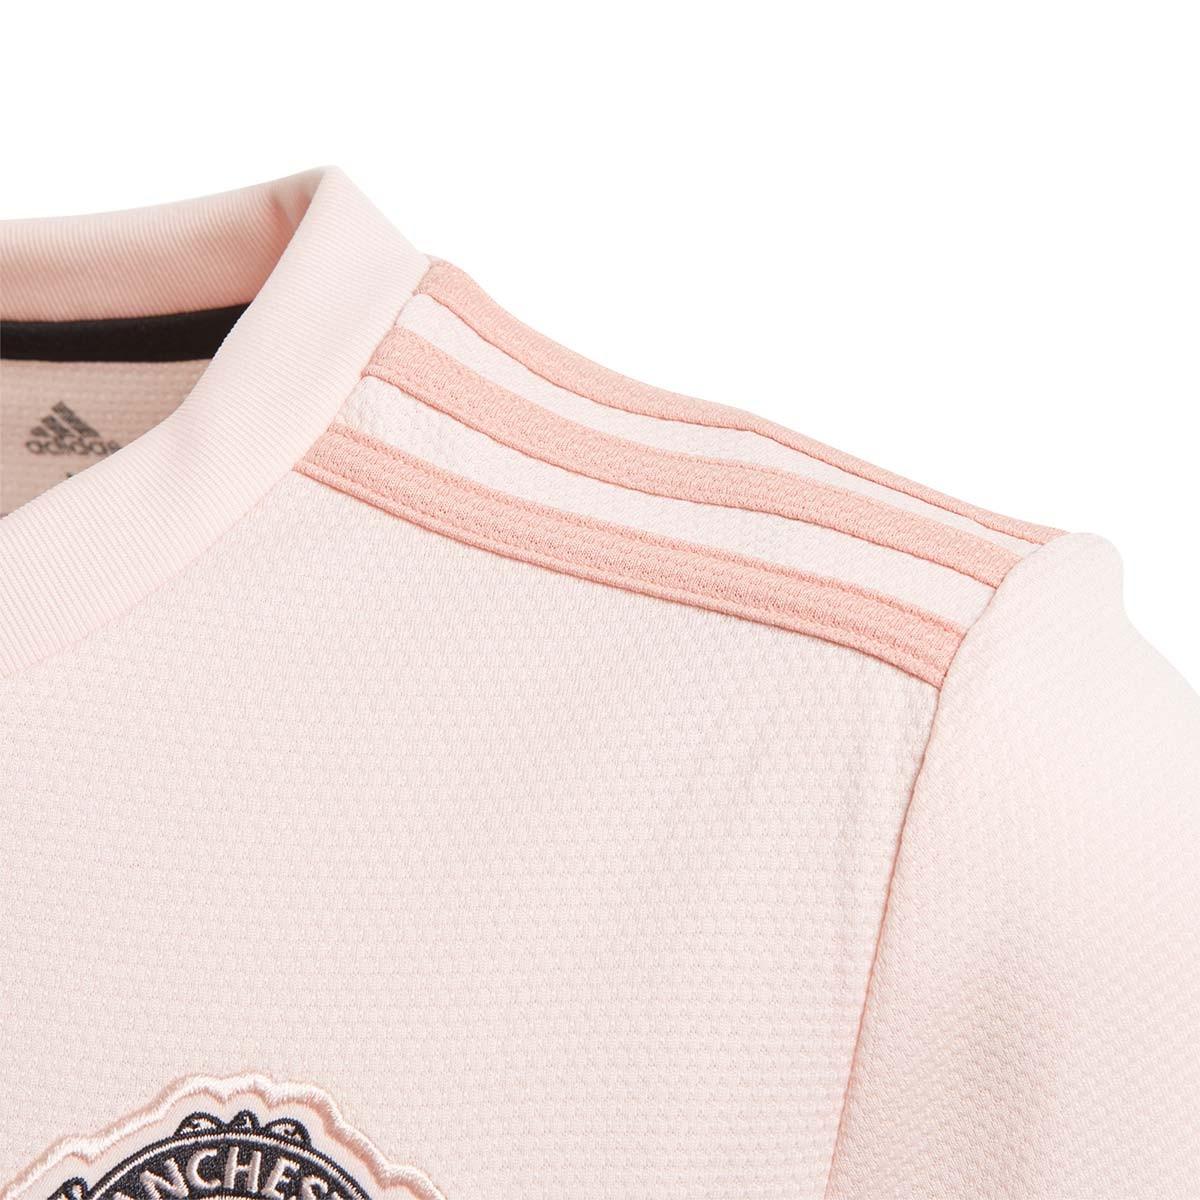 online store e621c 2cb84 Camiseta Manchester United FC Segunda Equipación 2018-2019 Niño Icey  pink-Trace pink-Black